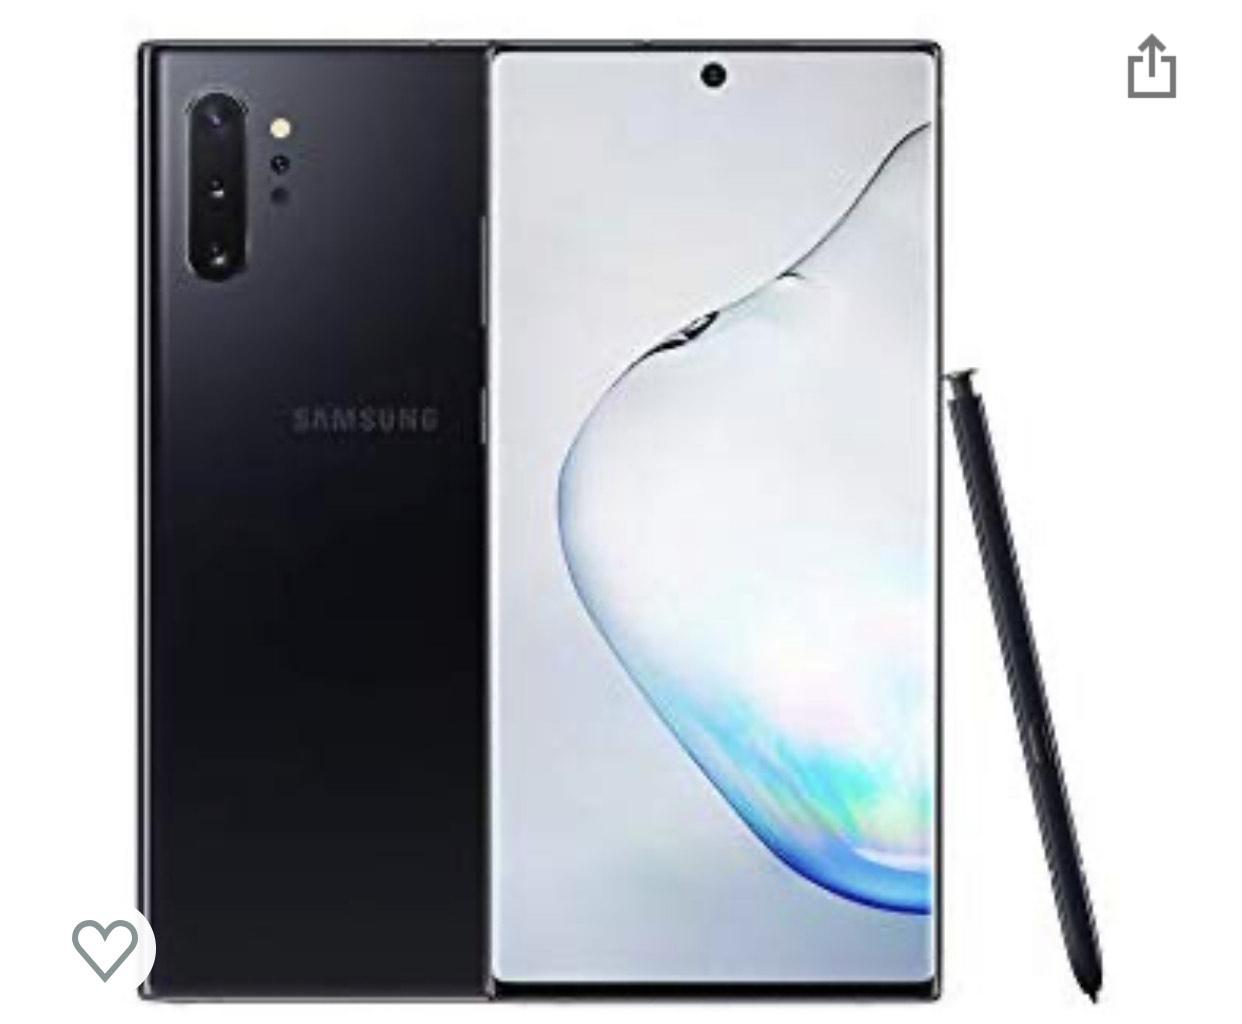 Samsung Galaxy Note 10+ 4g sim free at Amazon £784.98